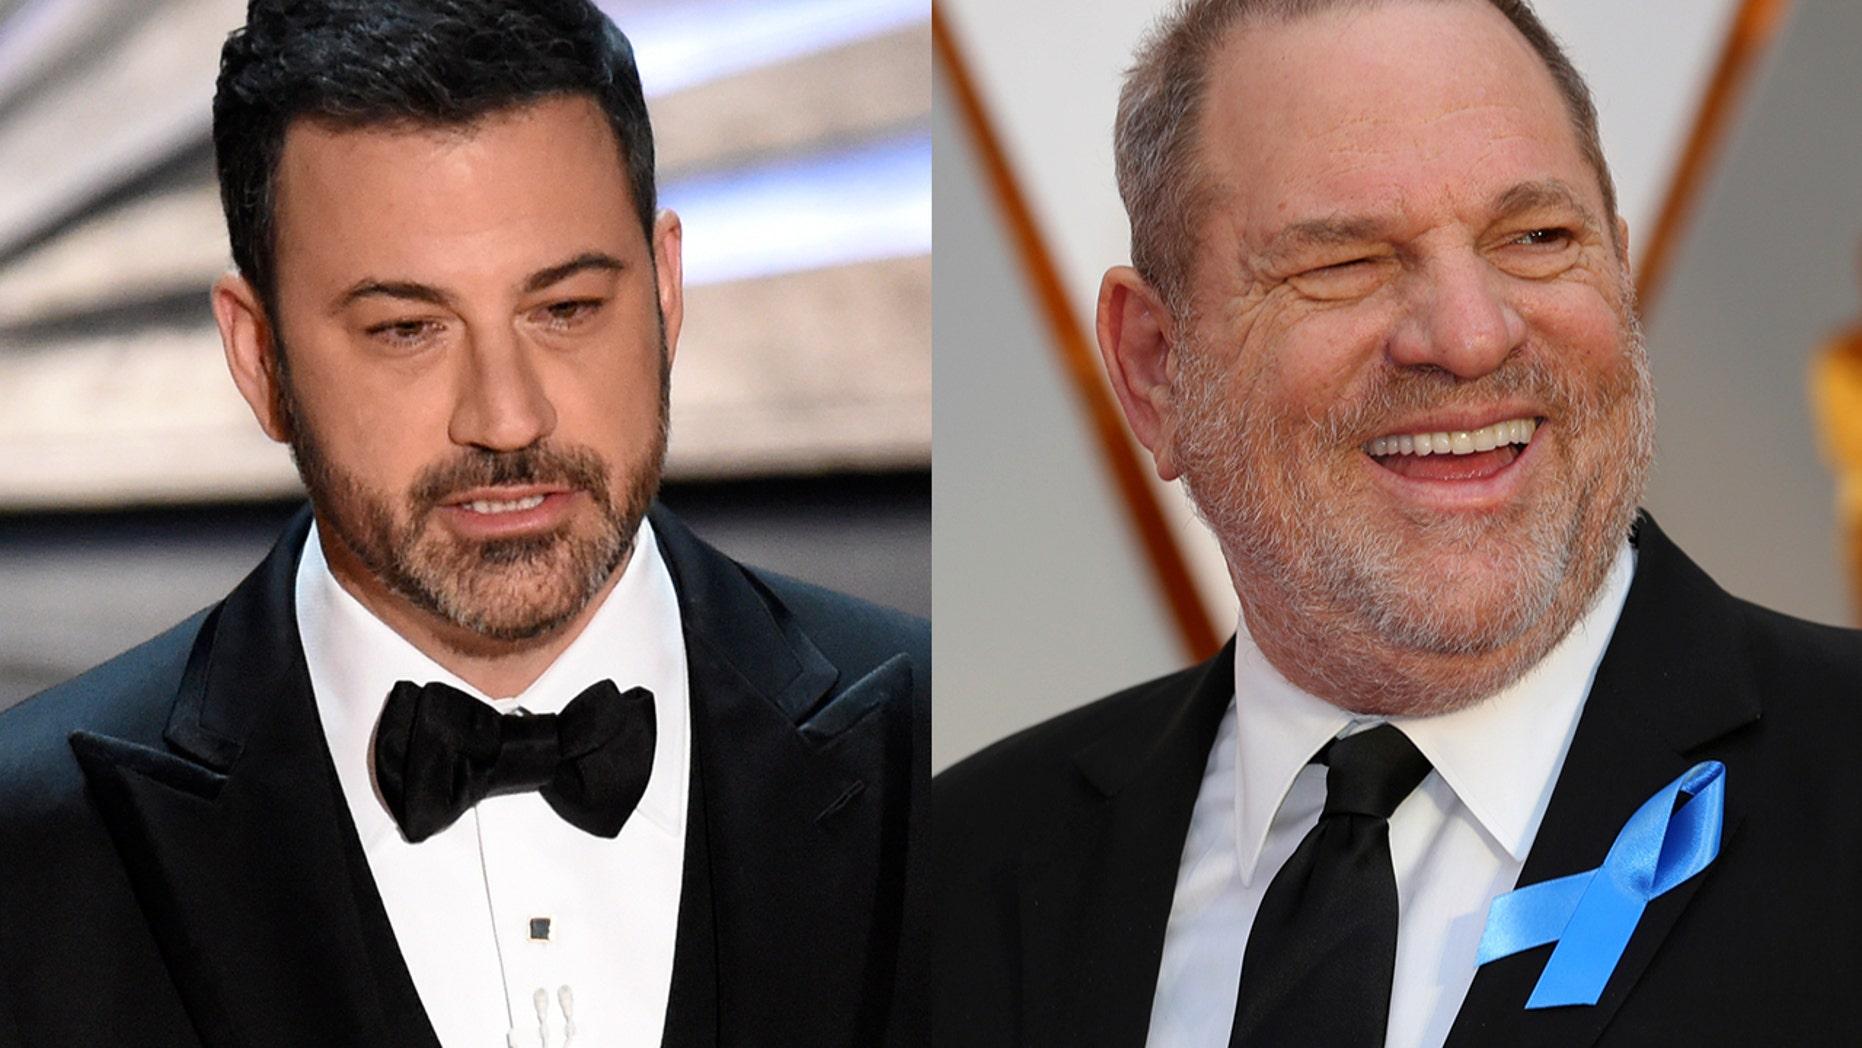 Harvey Weinstein was the butt of several jokes made by Oscars host Jimmy Kimmel.